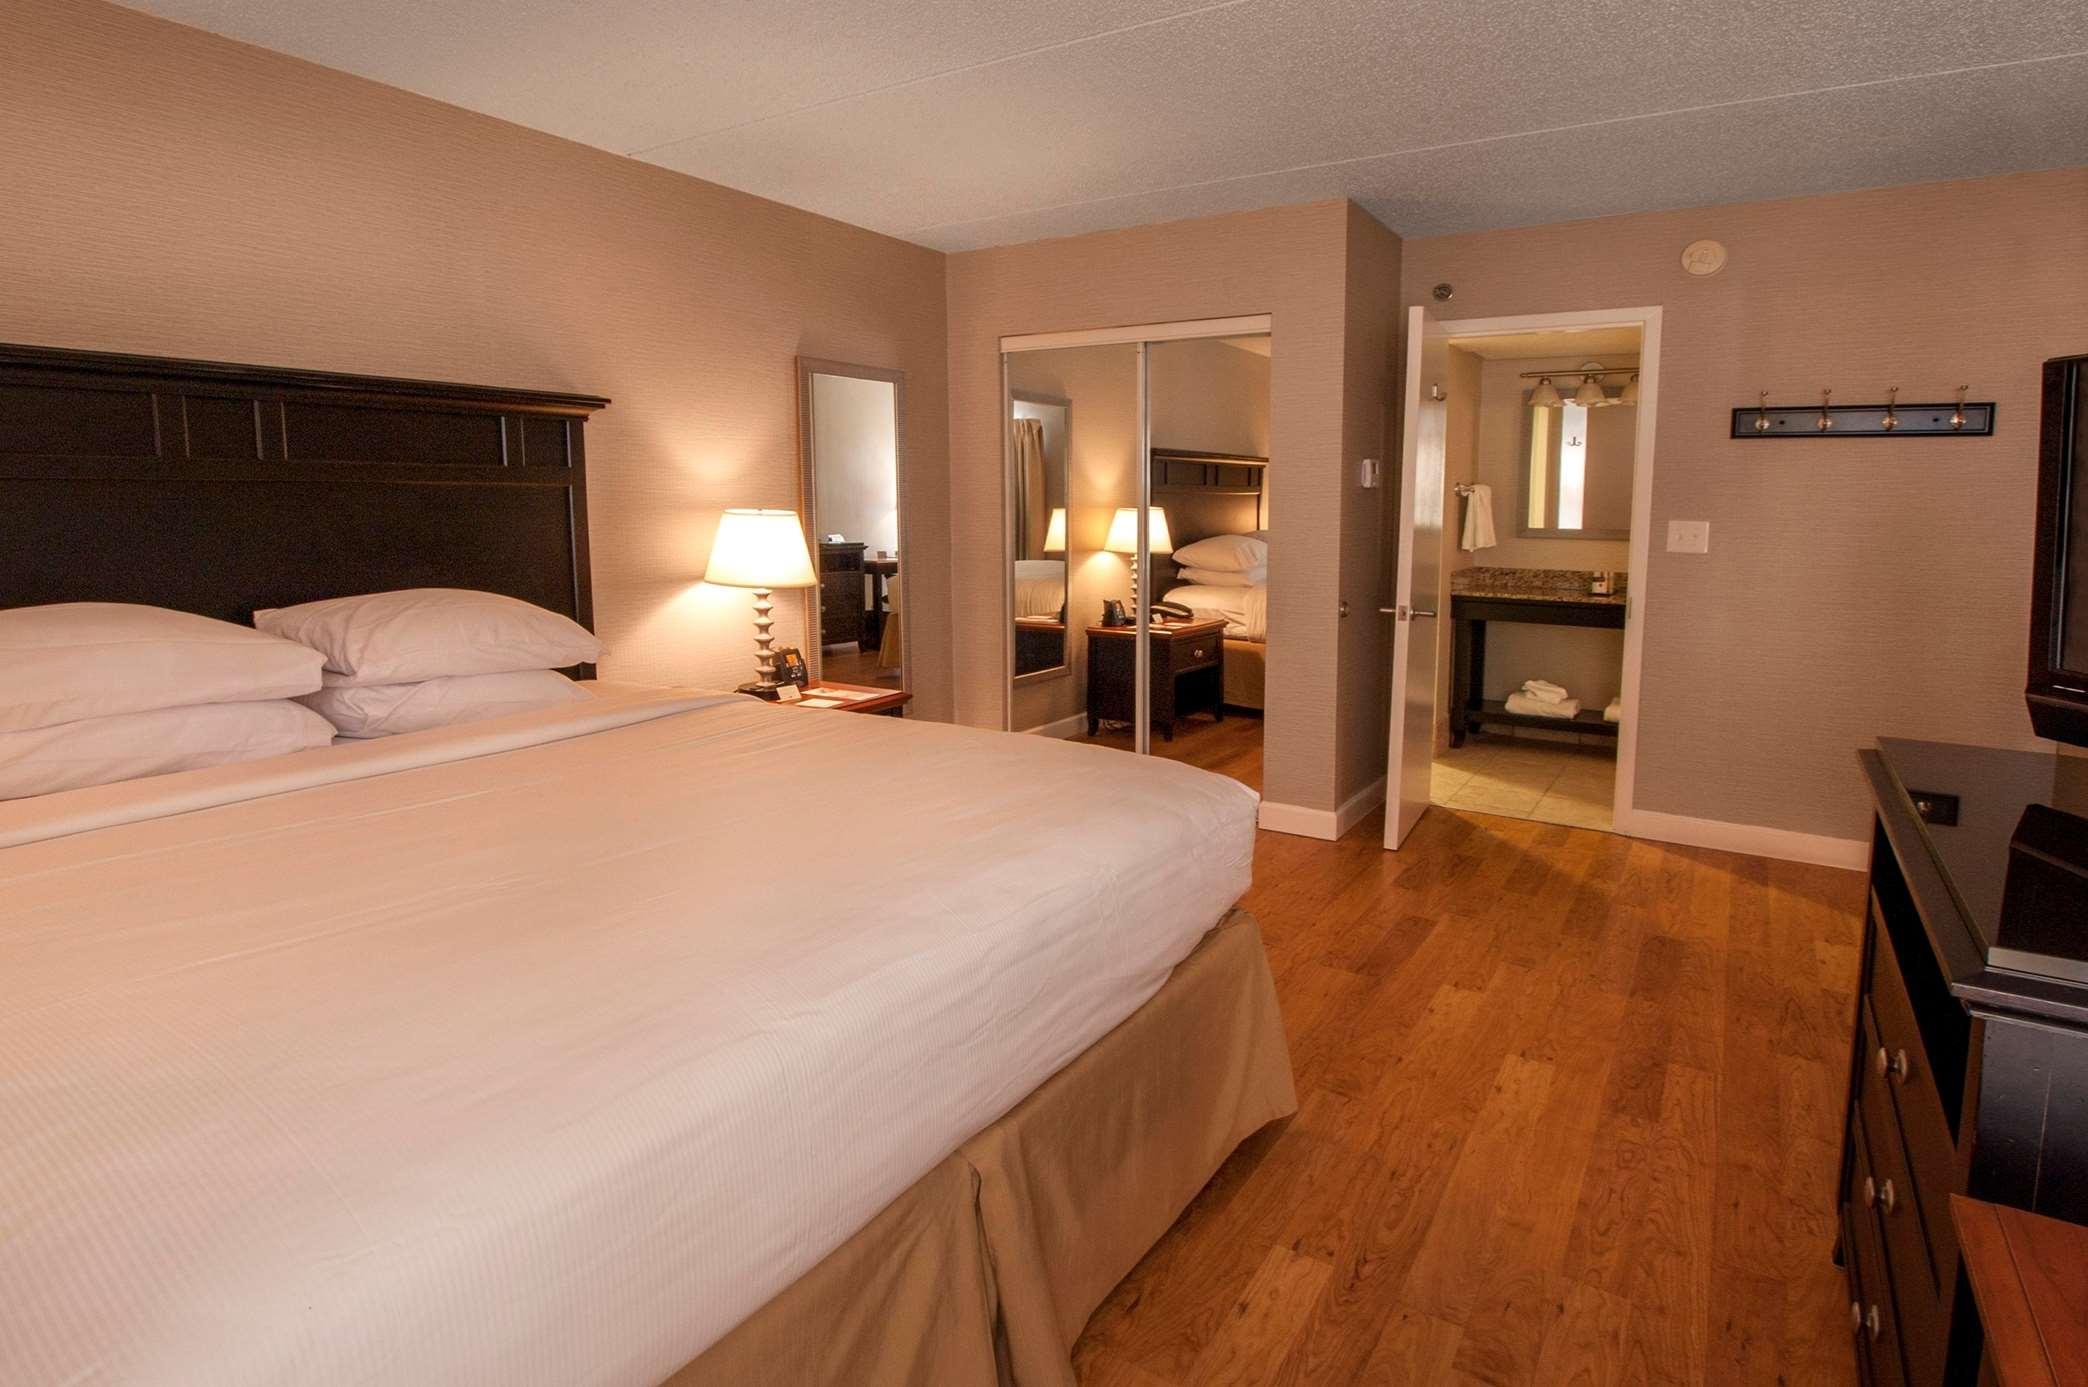 DoubleTree by Hilton Hotel Buffalo - Amherst image 12